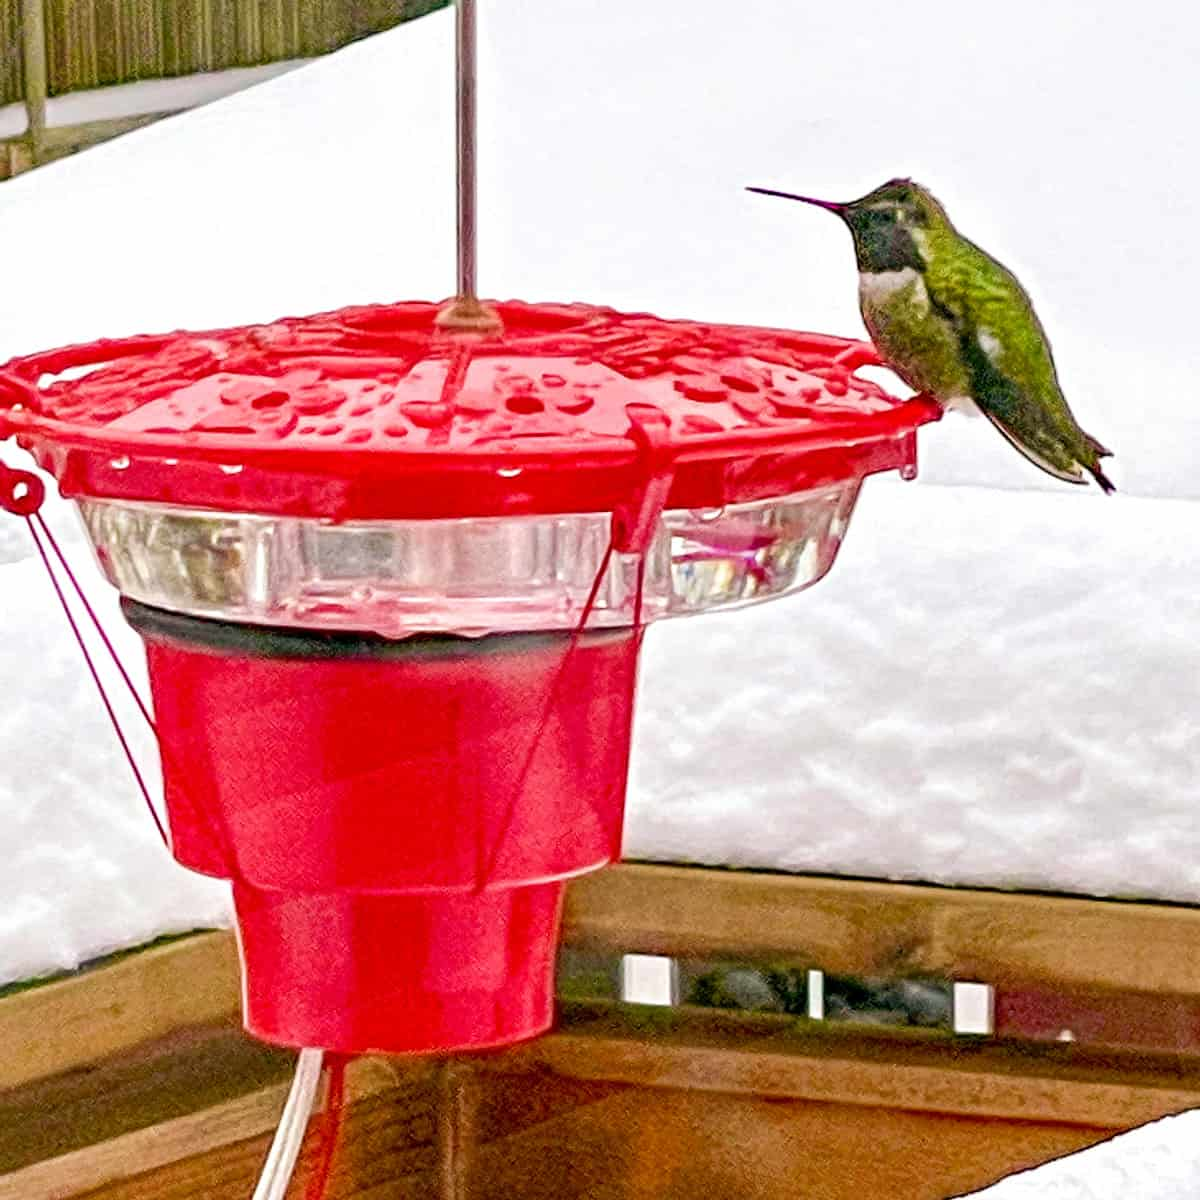 Anna's hummingbird at heated hummingbird feeder in the snow